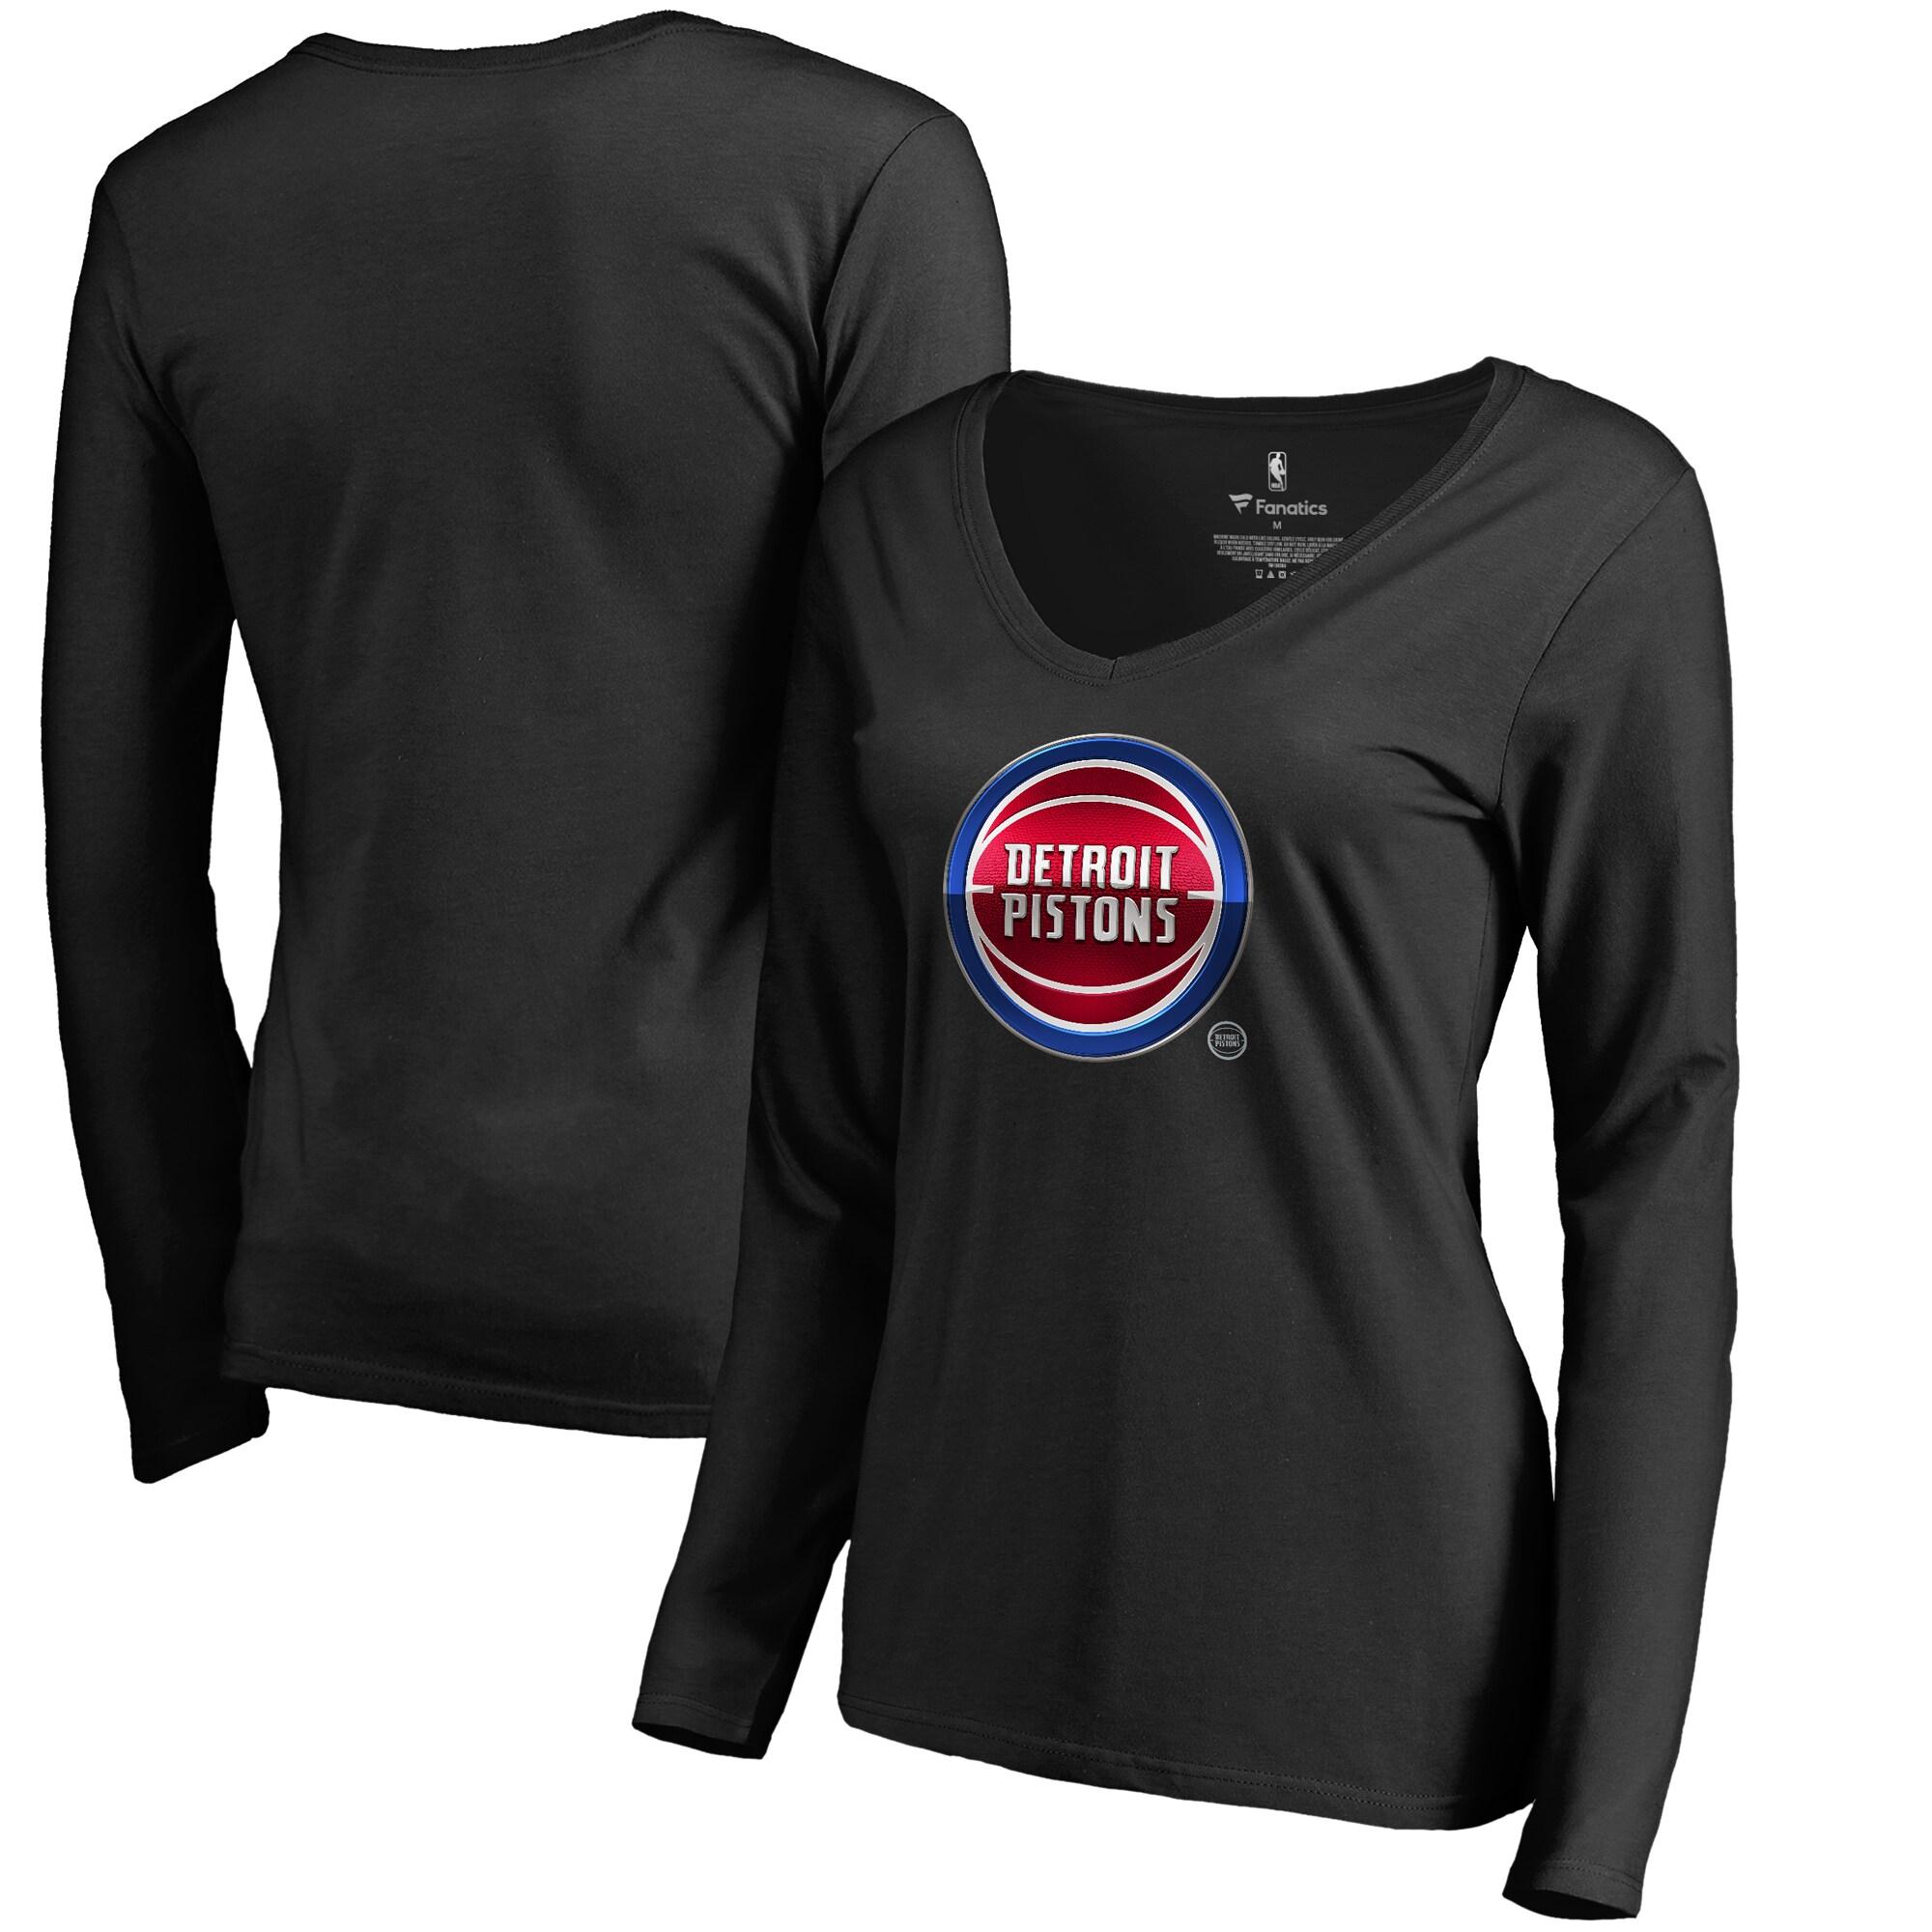 Detroit Pistons Fanatics Branded Women's Midnight Mascot Long Sleeve V-Neck T-Shirt - Black